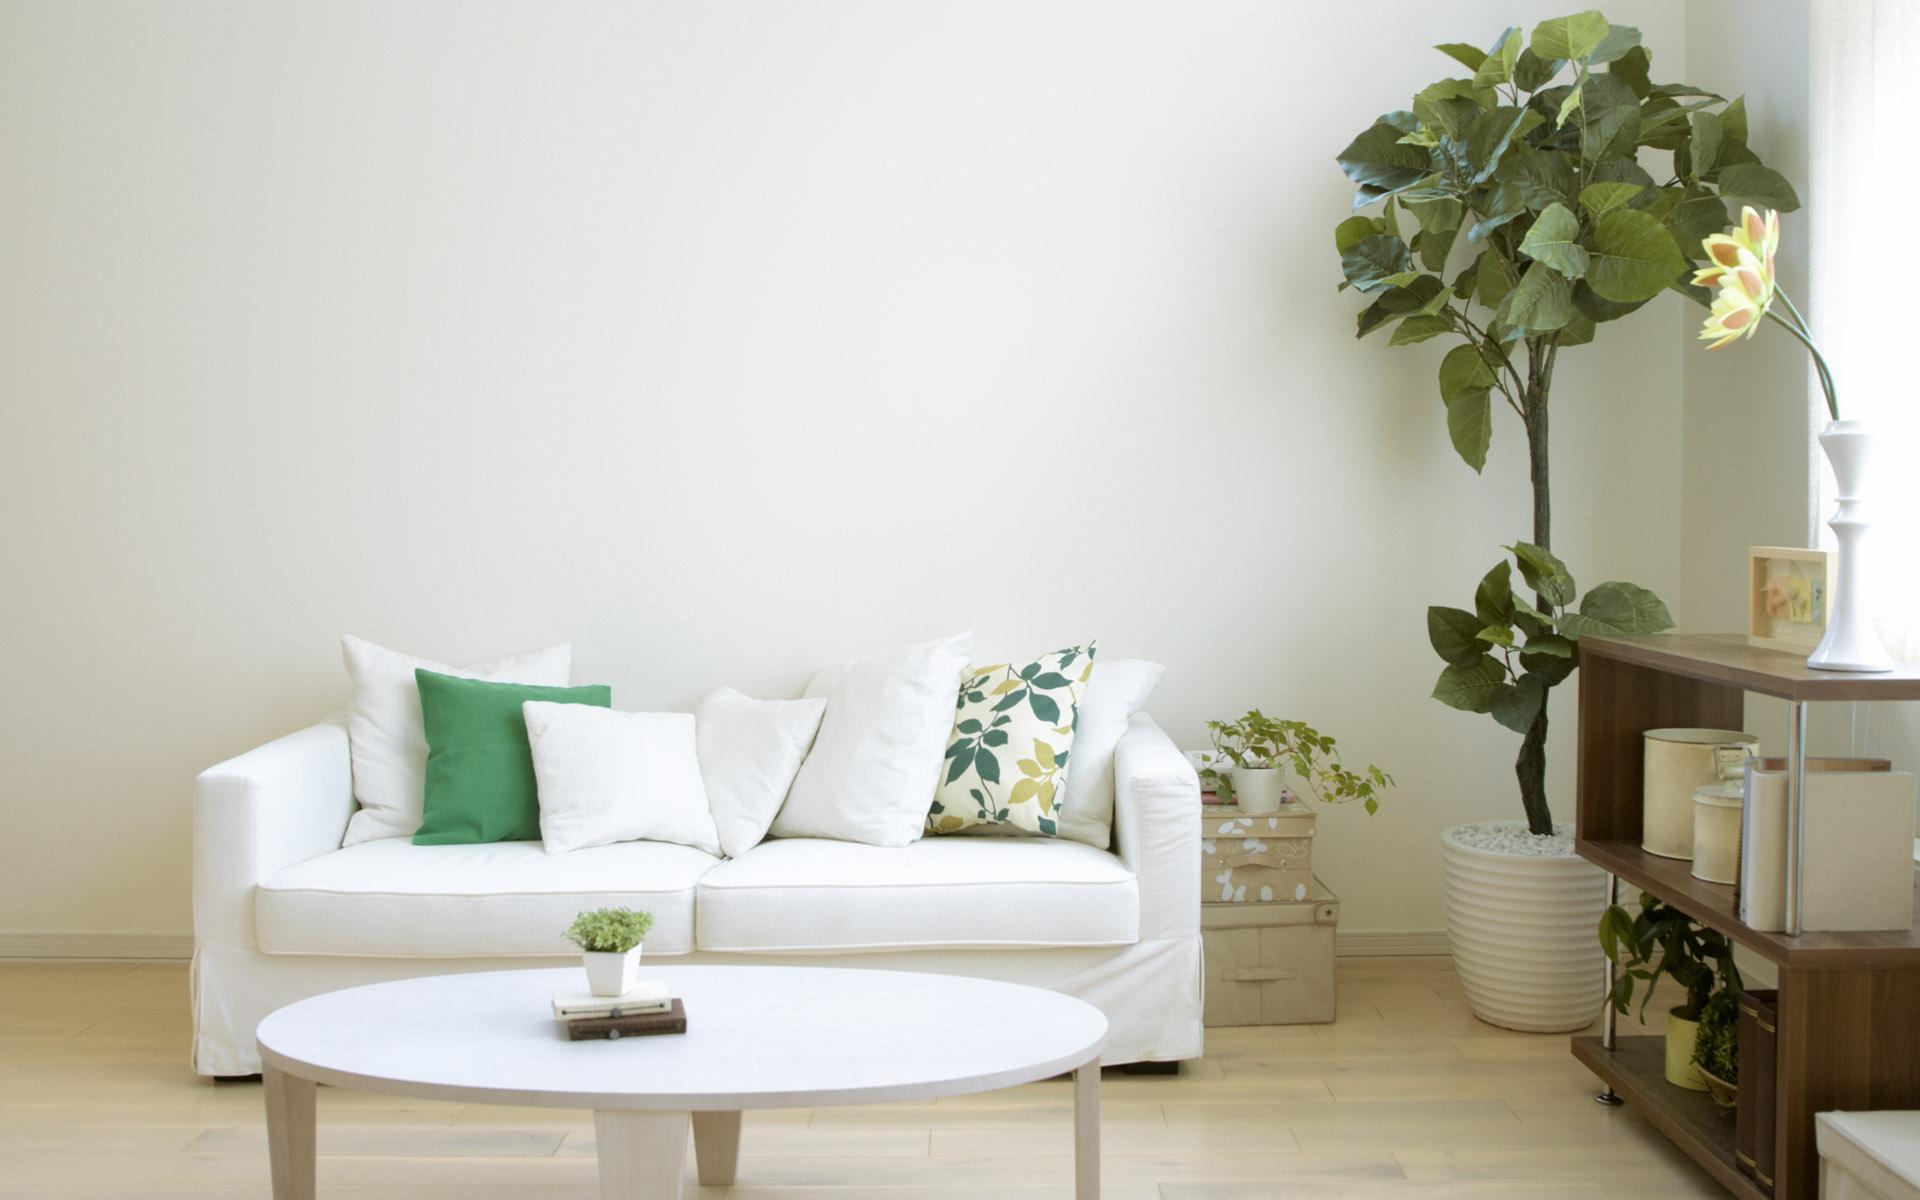 Home Decor Photos Free: Room Desktop Wallpaper